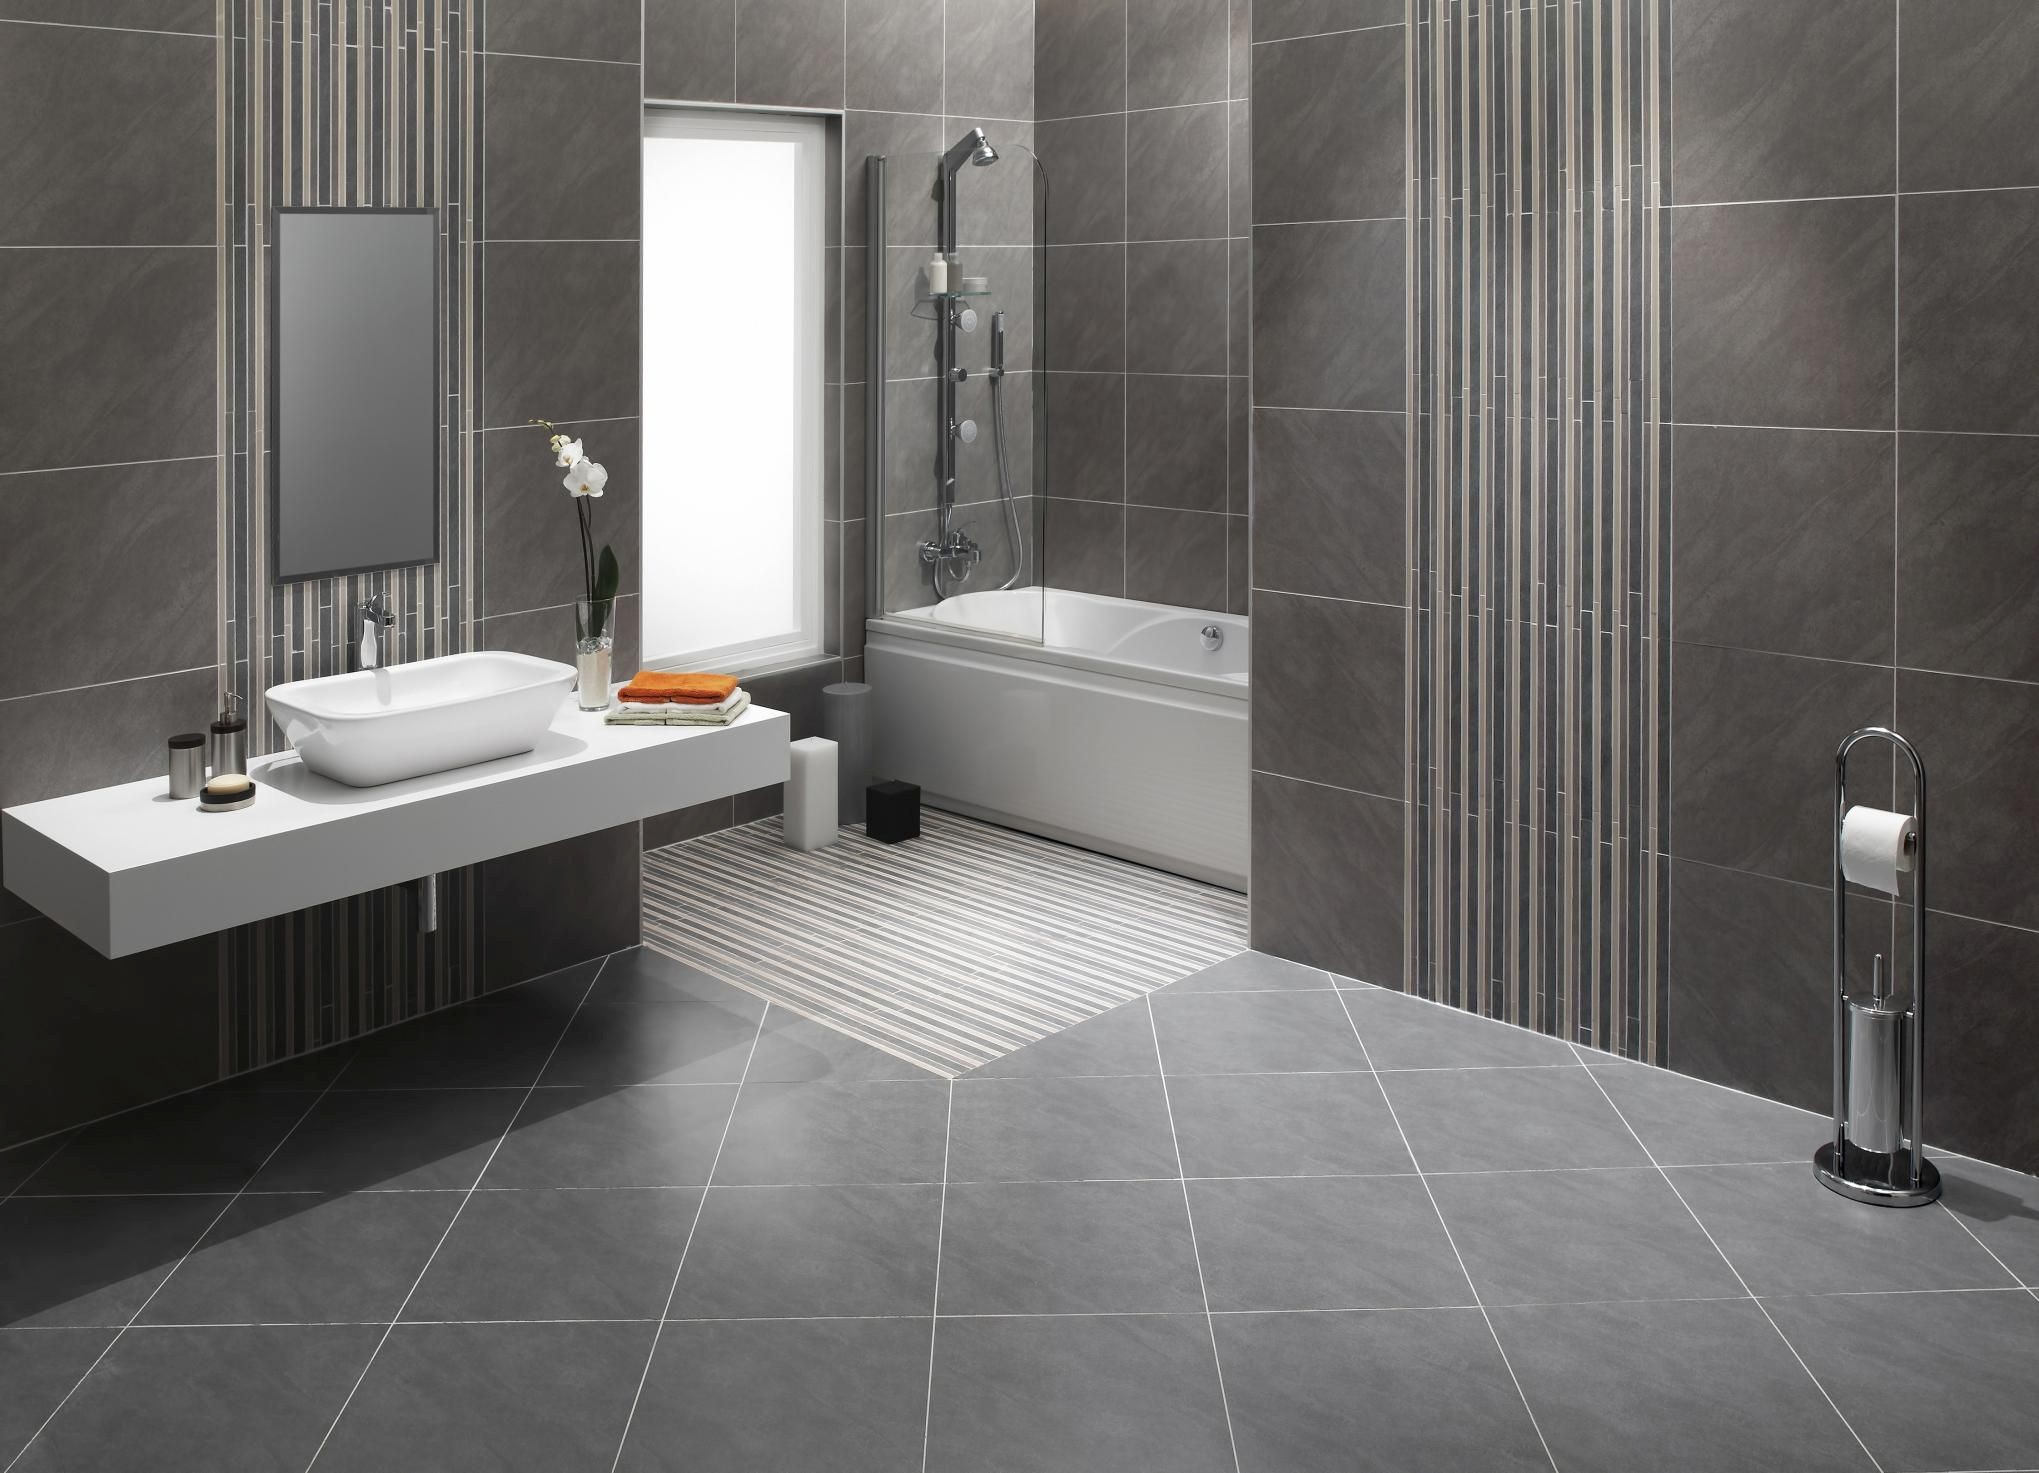 Best Flooring for Bathroom Latest Natural Stone Bathroom Floor Should You Install It Online